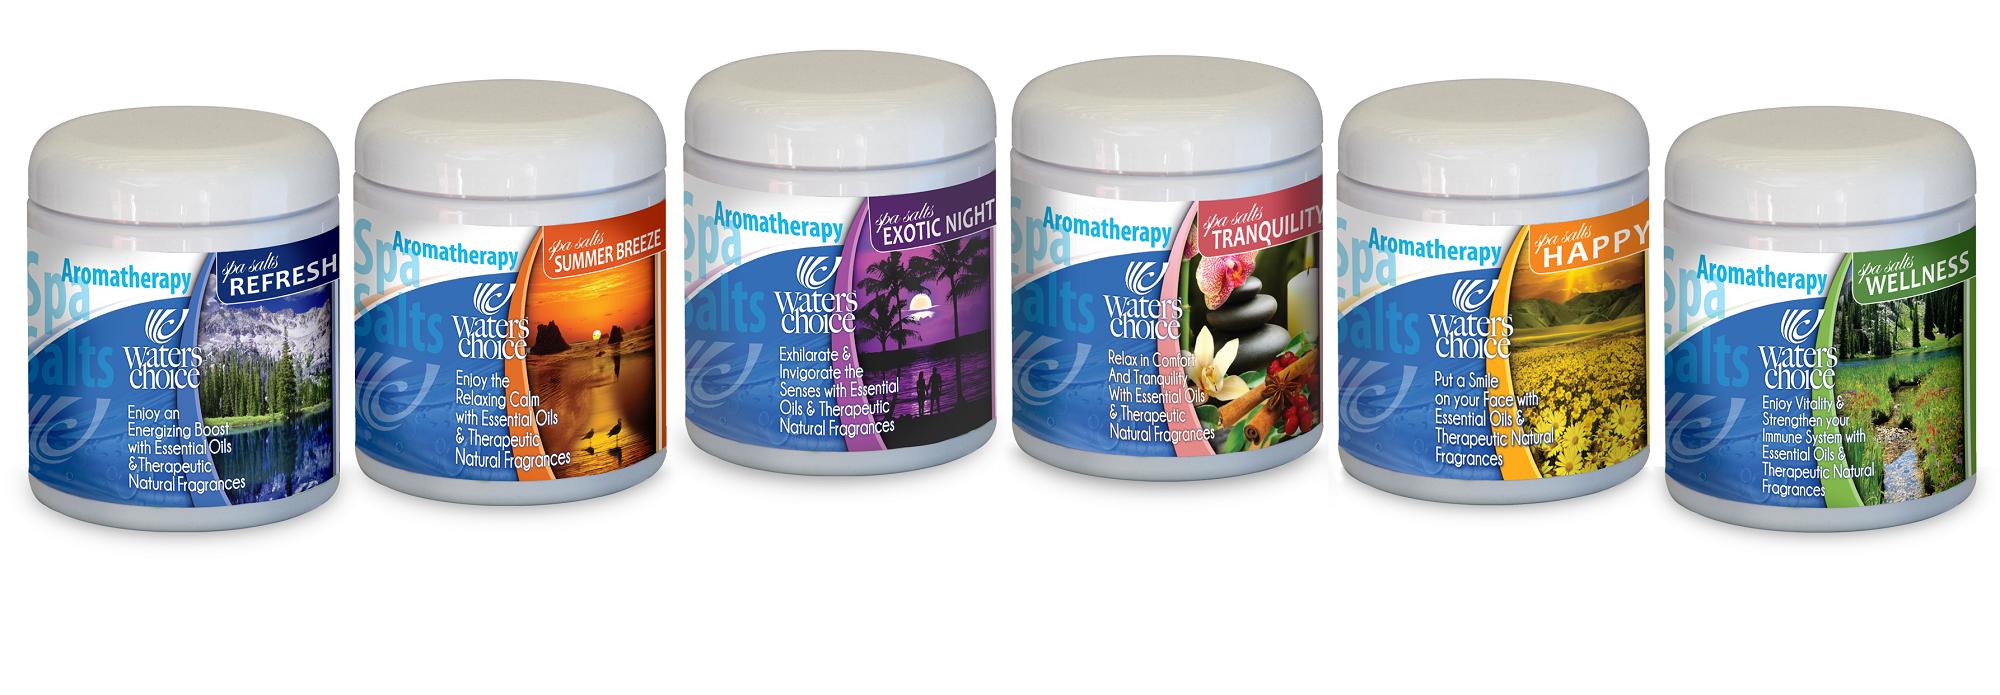 Aromatherapy Salts